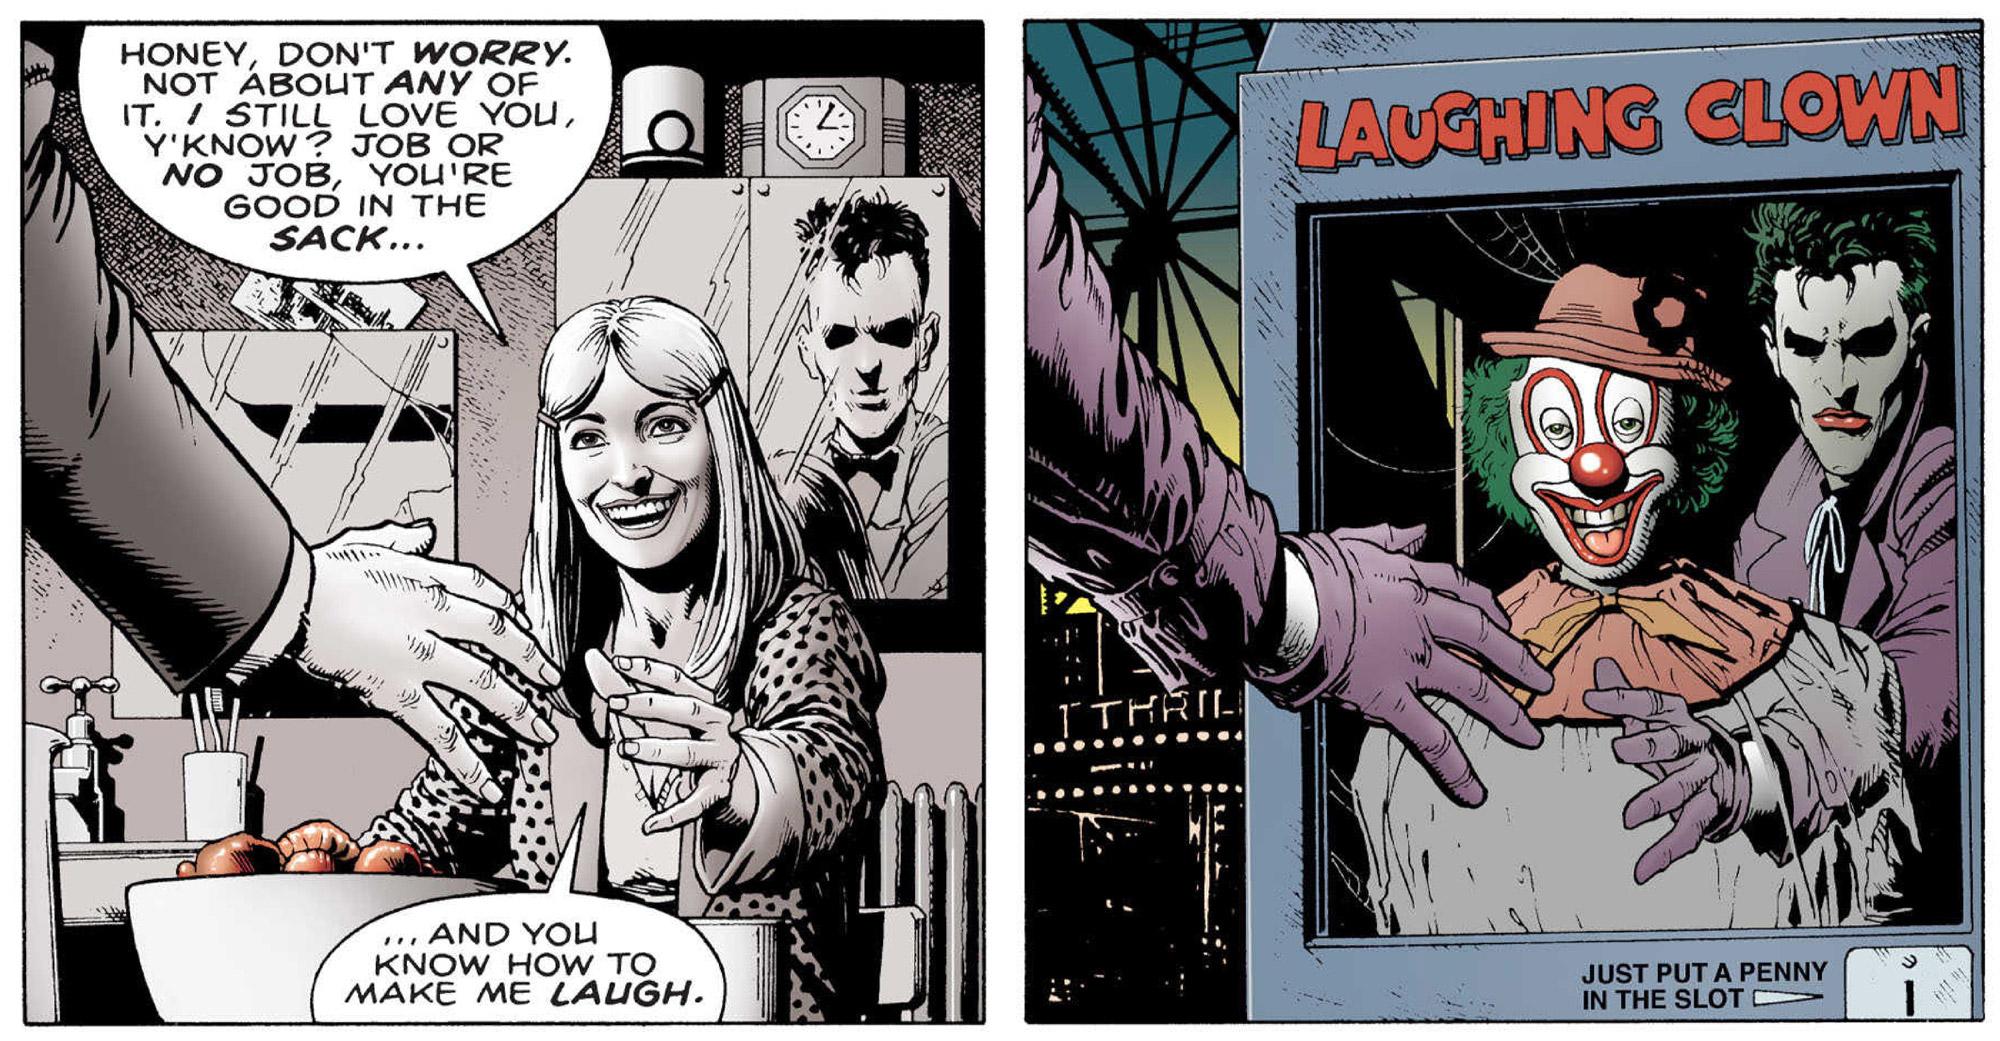 The darkness of Joker